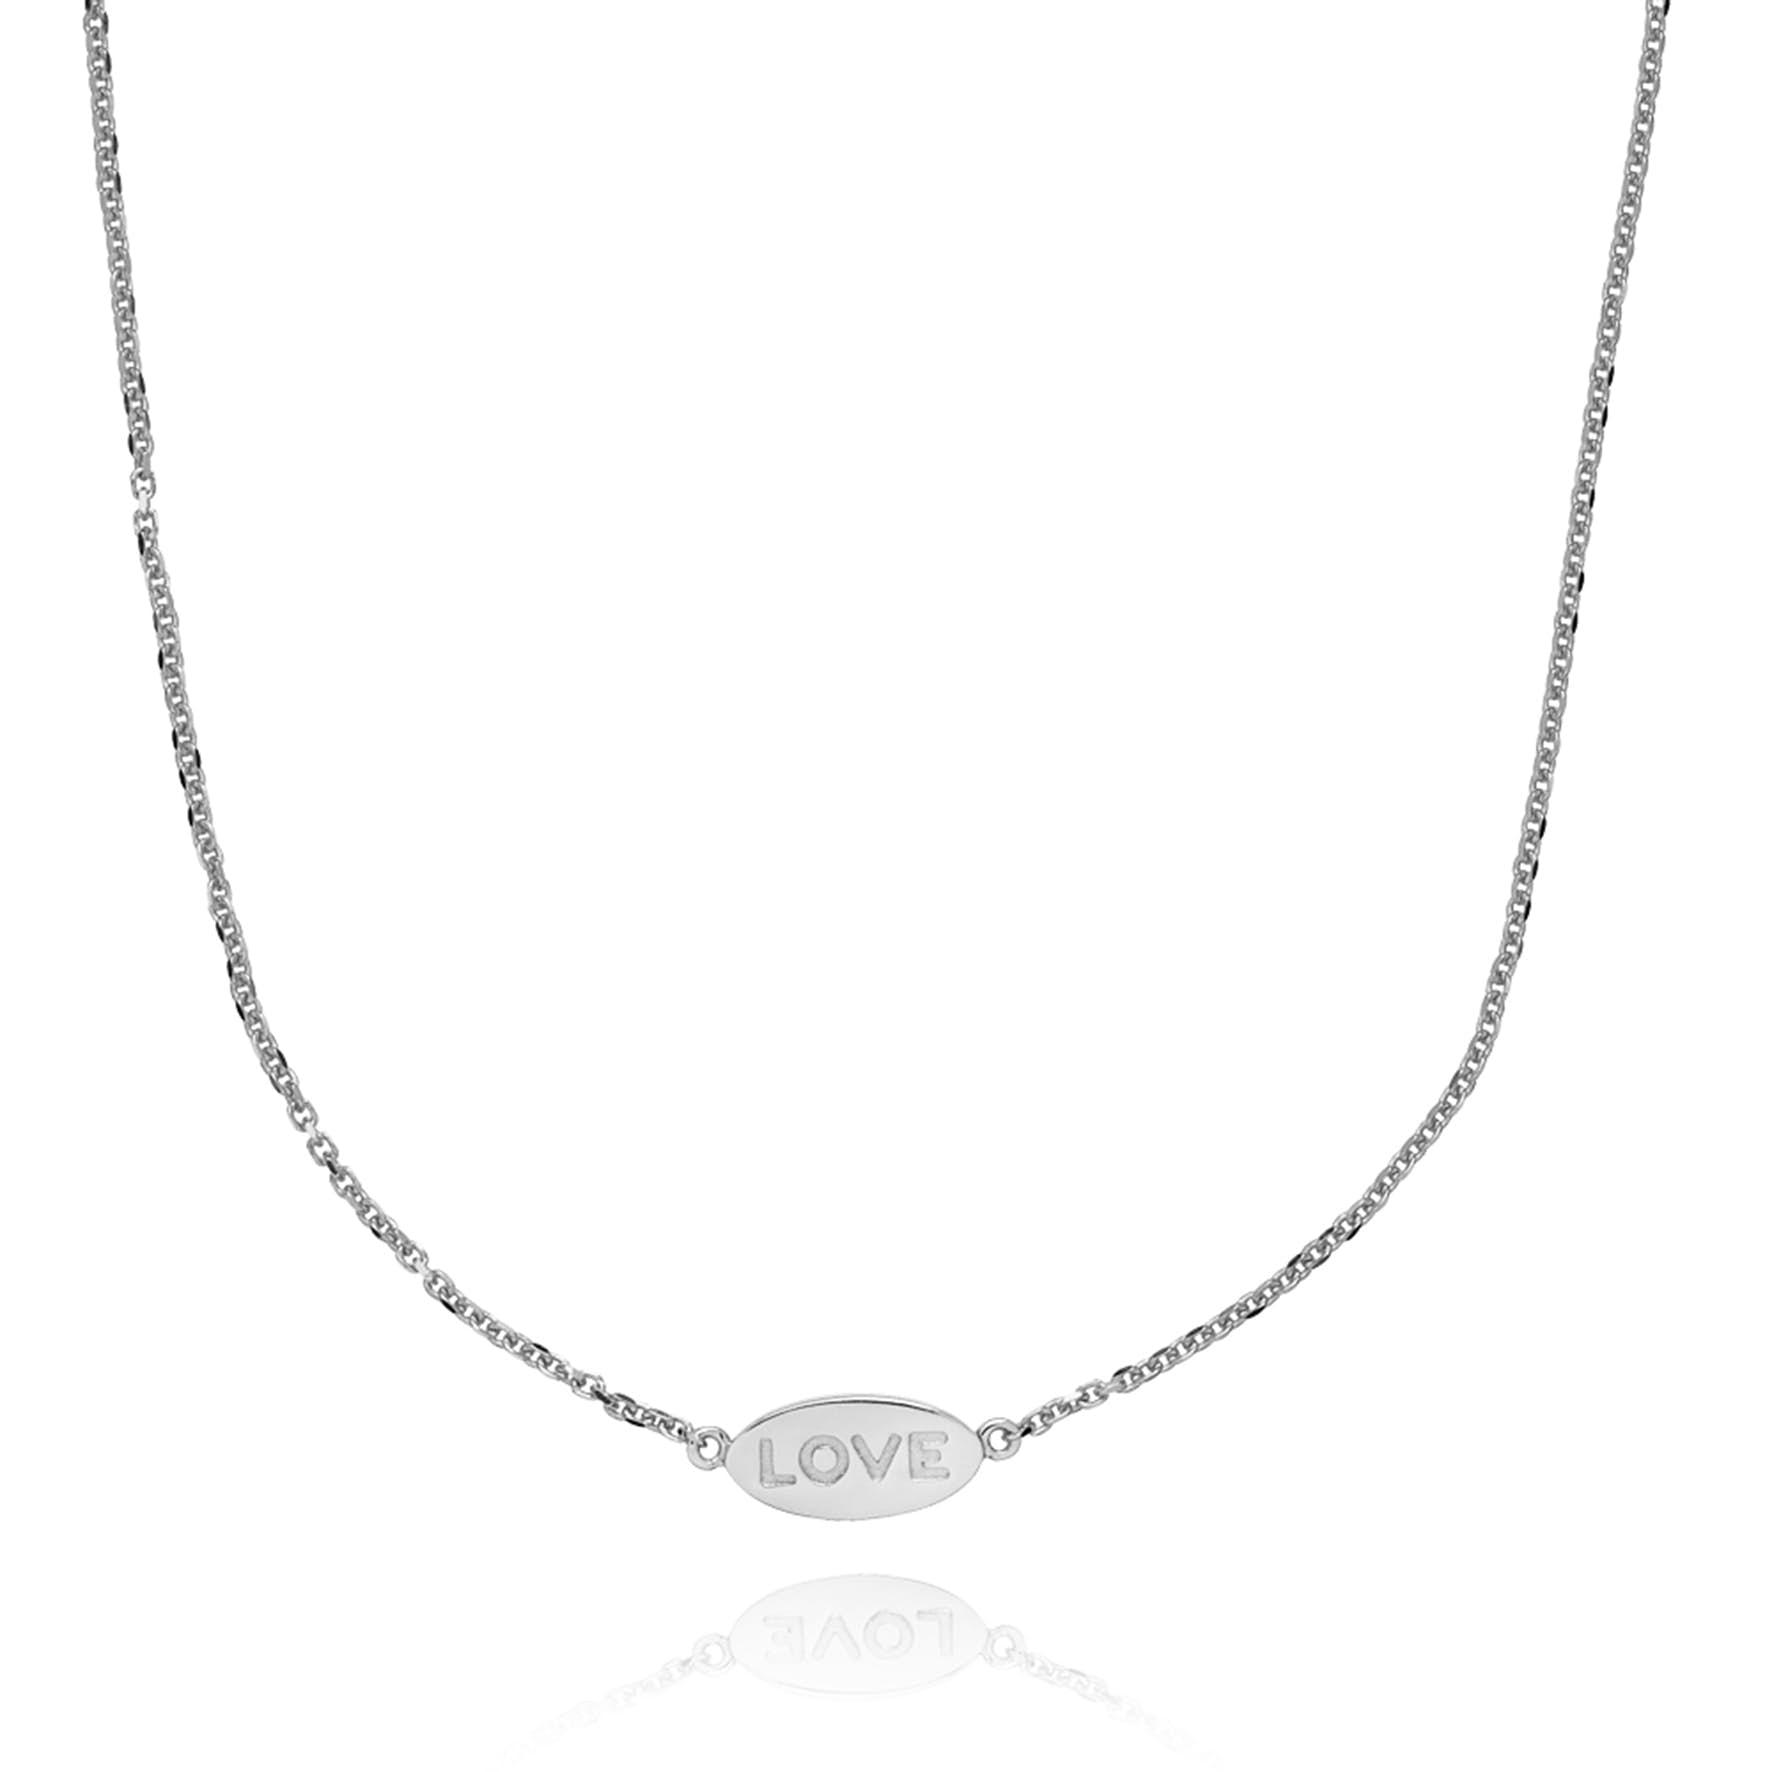 Fam Love Necklace från Sistie i Silver Sterling 925